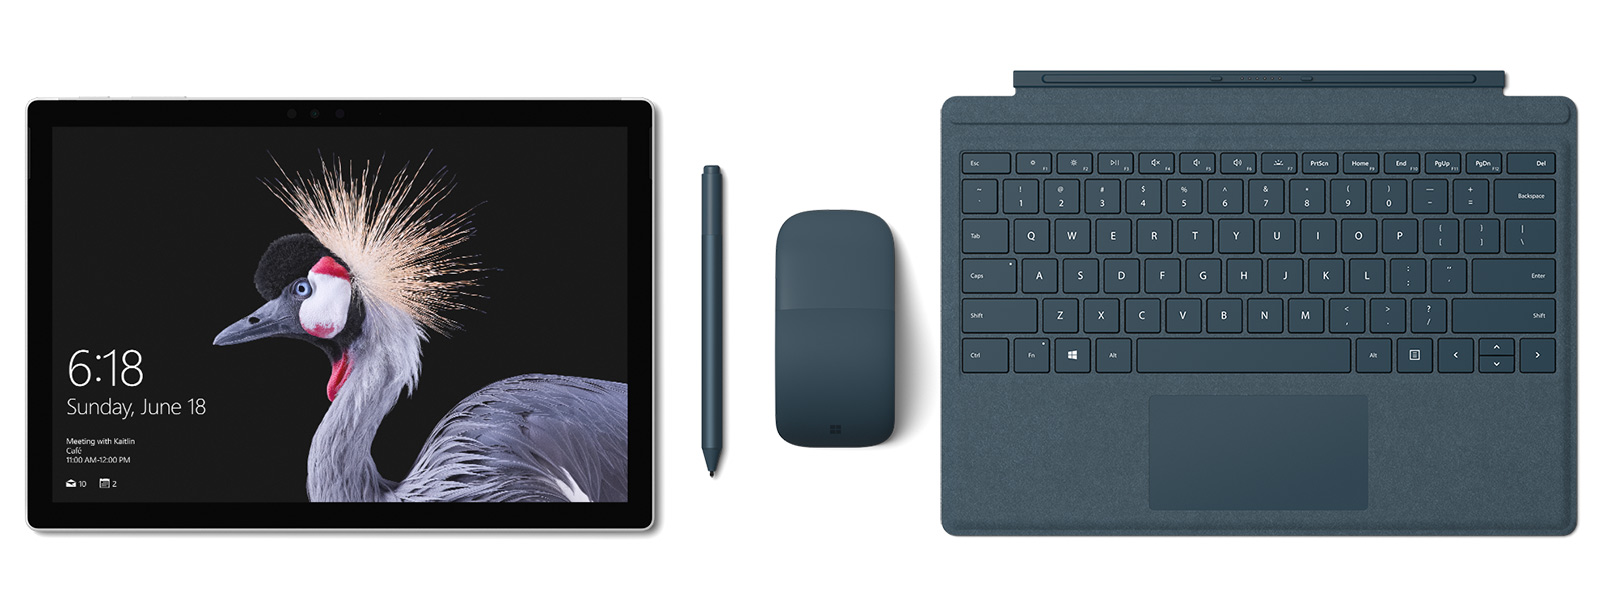 Afbeelding van Surface Pro met Surface Pro Signature Type Cover, Surface-pen en Surface Arc Mouse in kobaltblauw. Geleverd met Surface-pen.